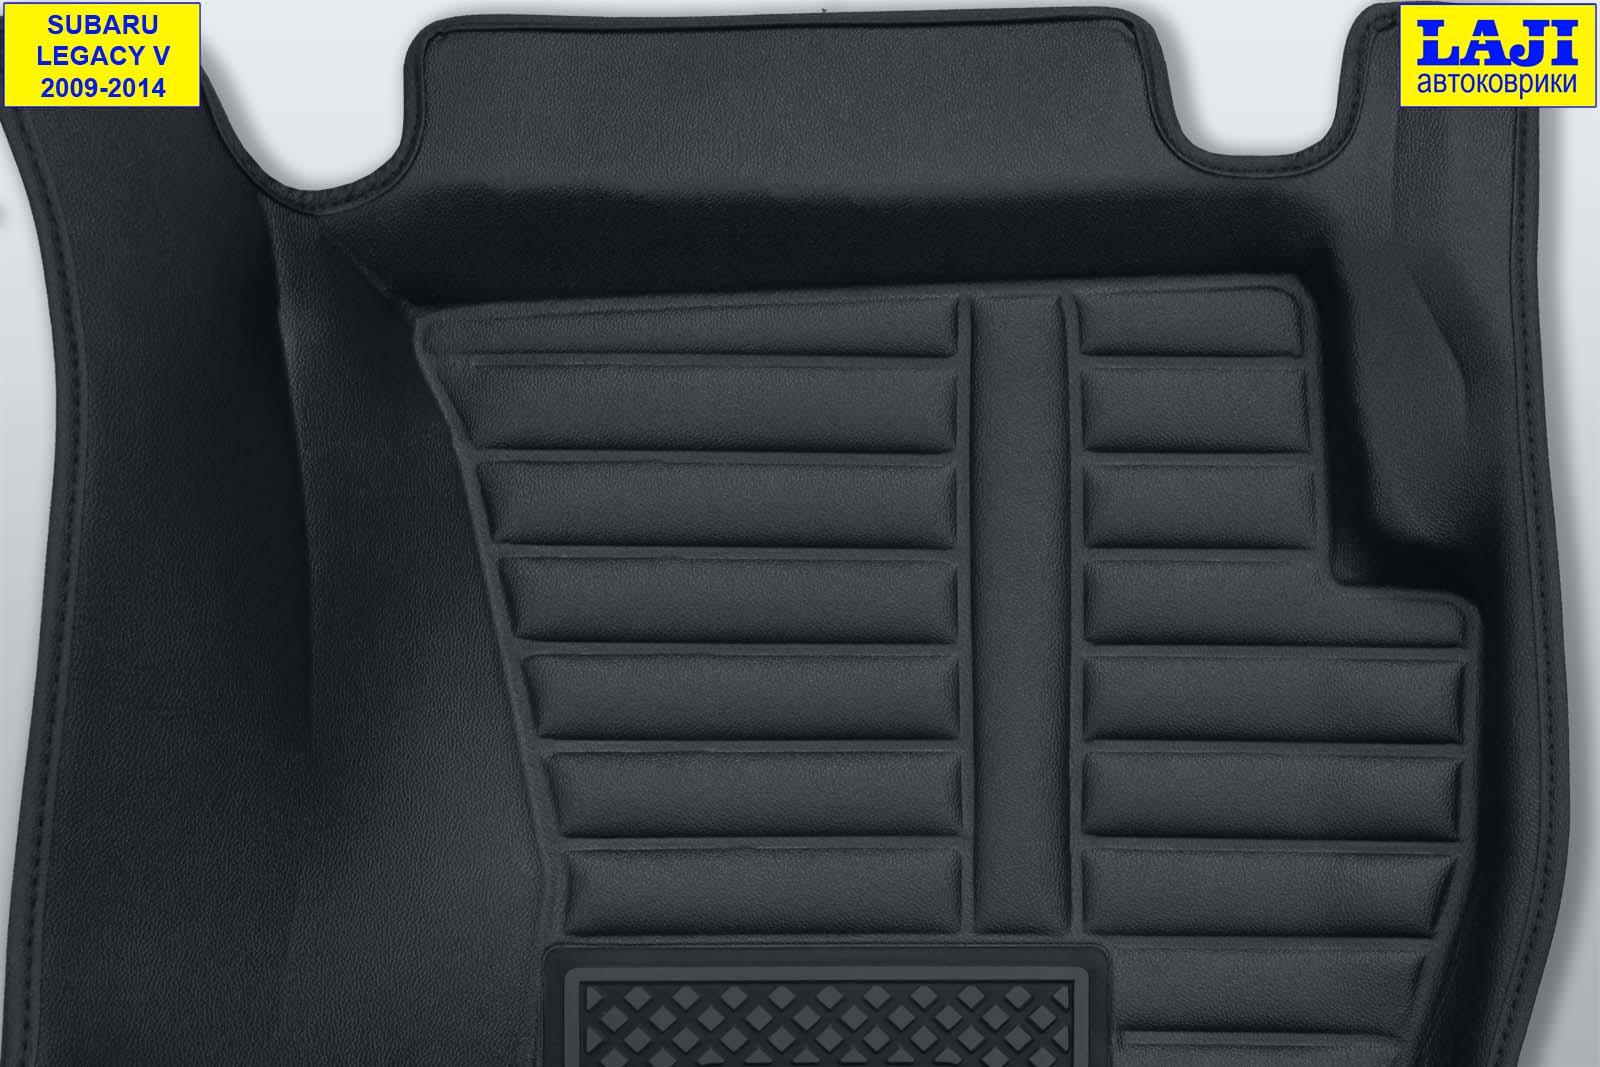 5D коврики в салон Subaru Legacy 5 2009-2014 8